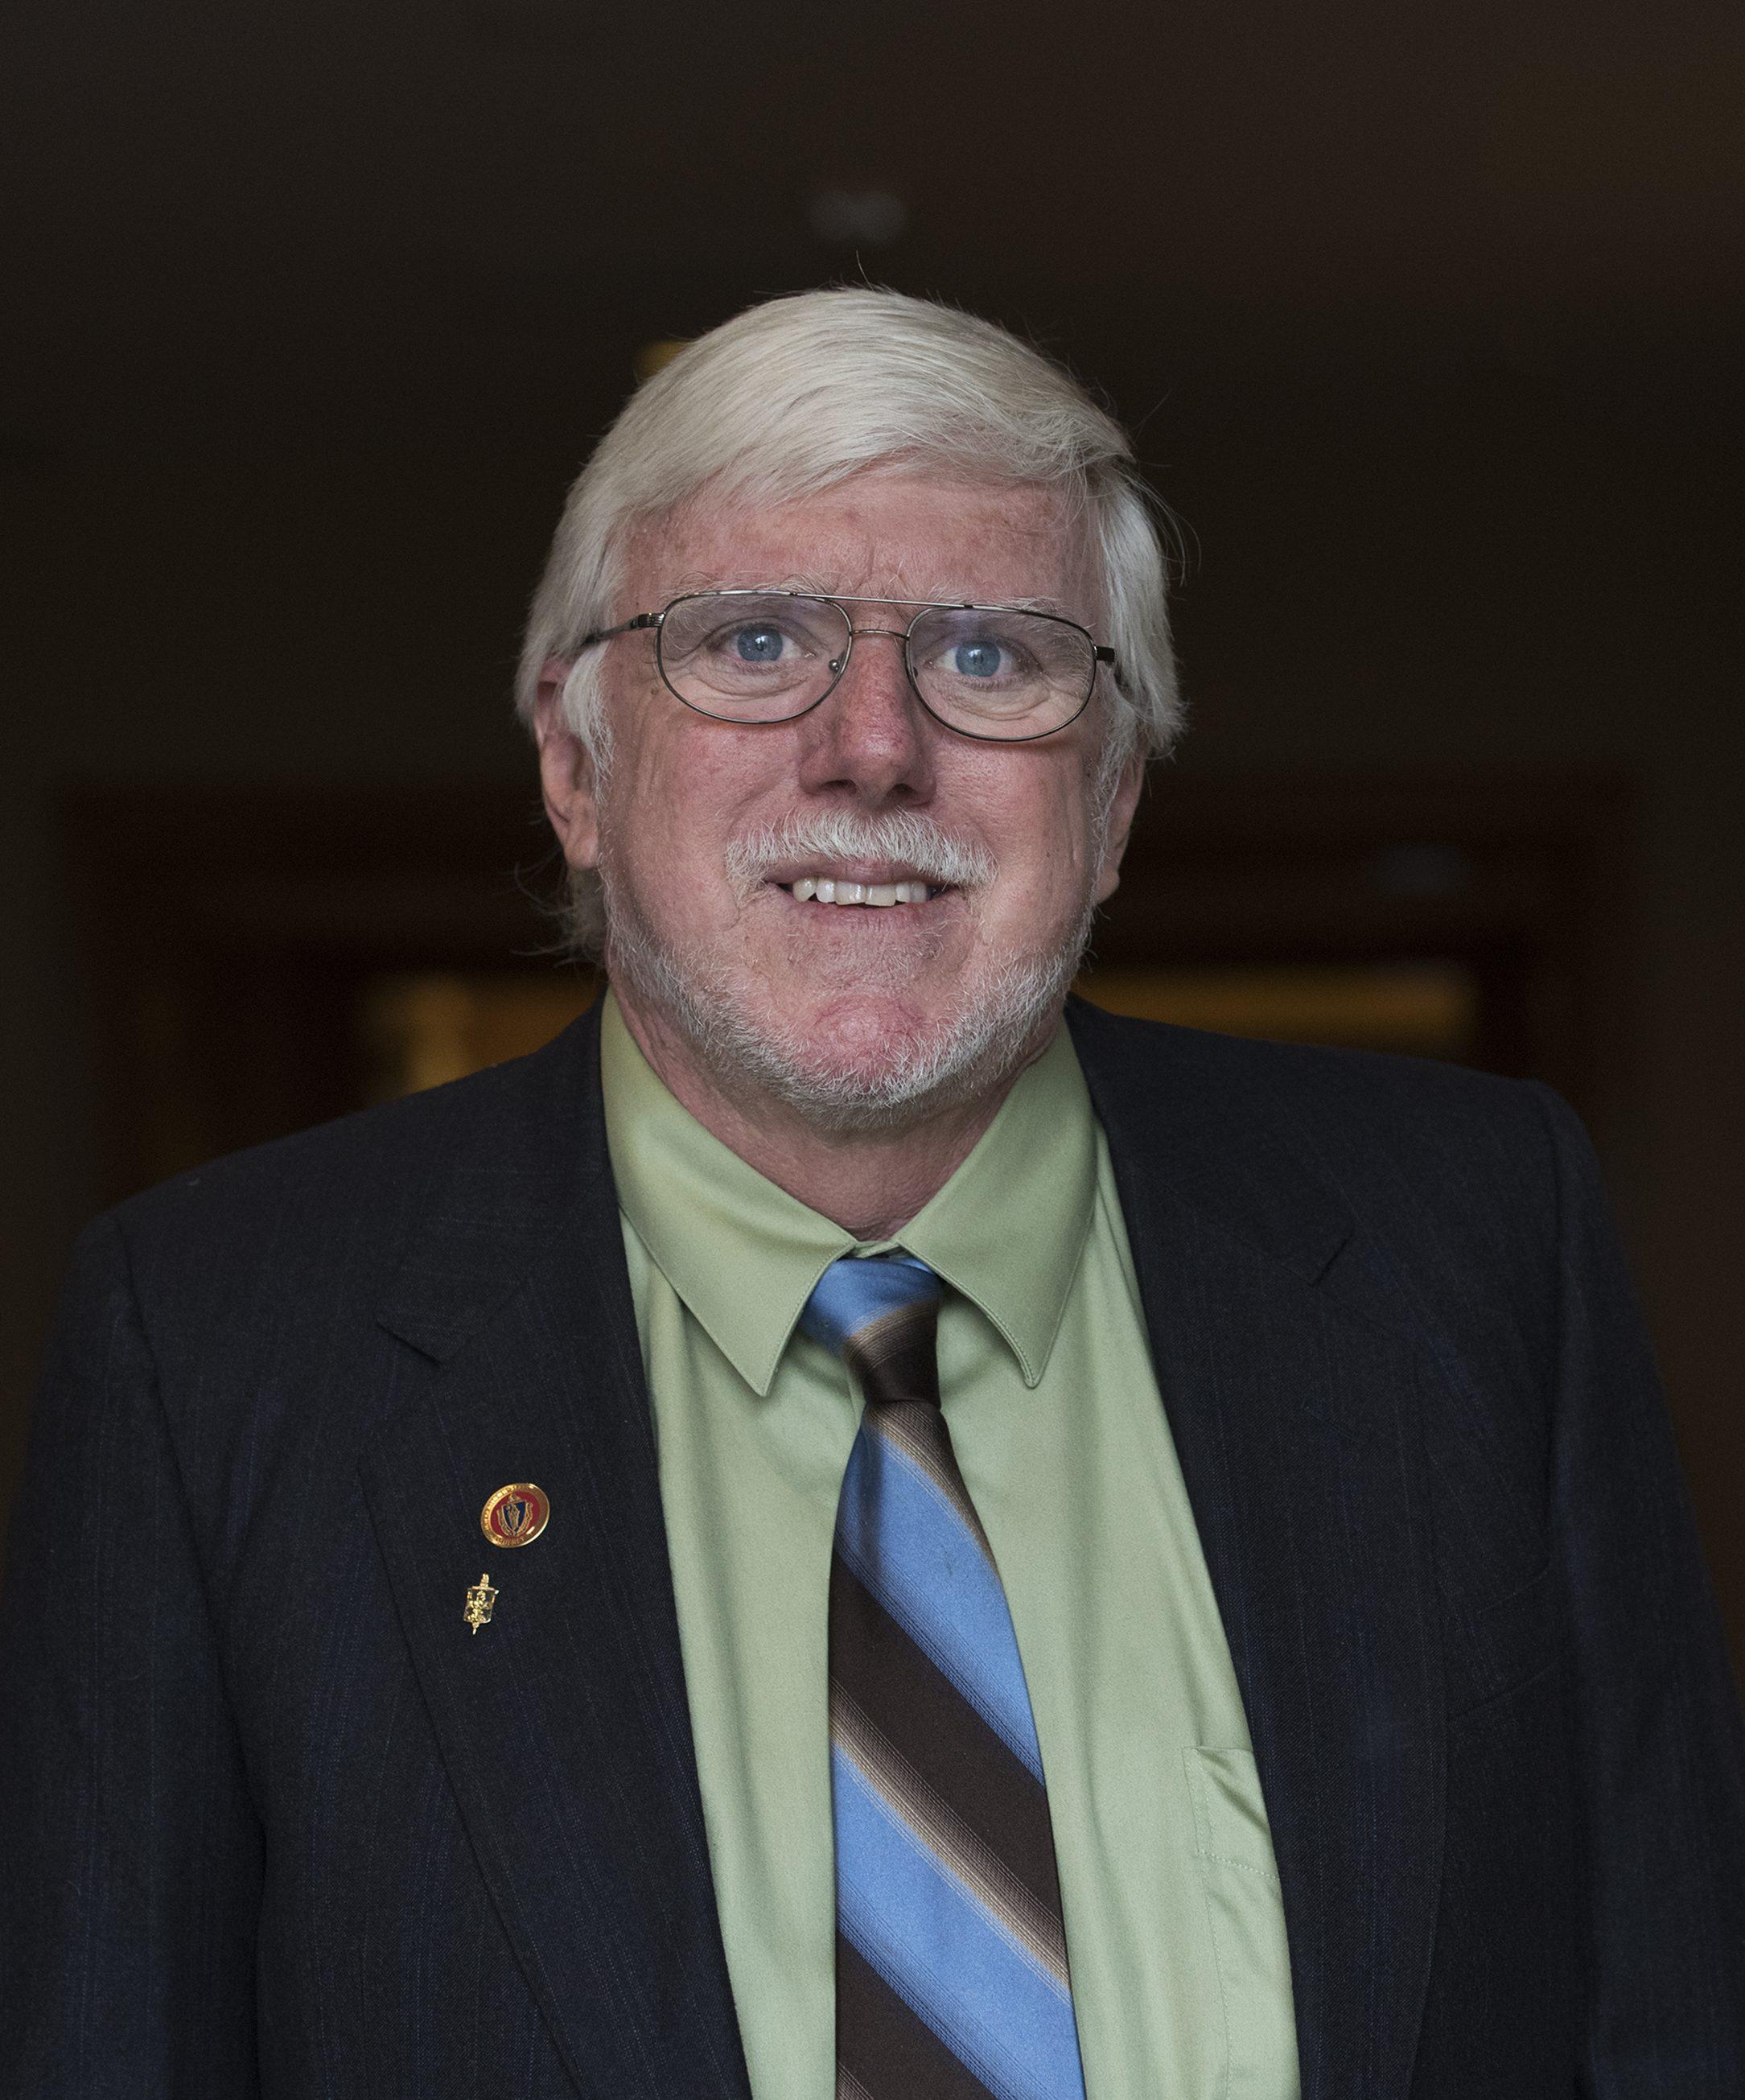 Daniel S. Gerber, EdD, MPH